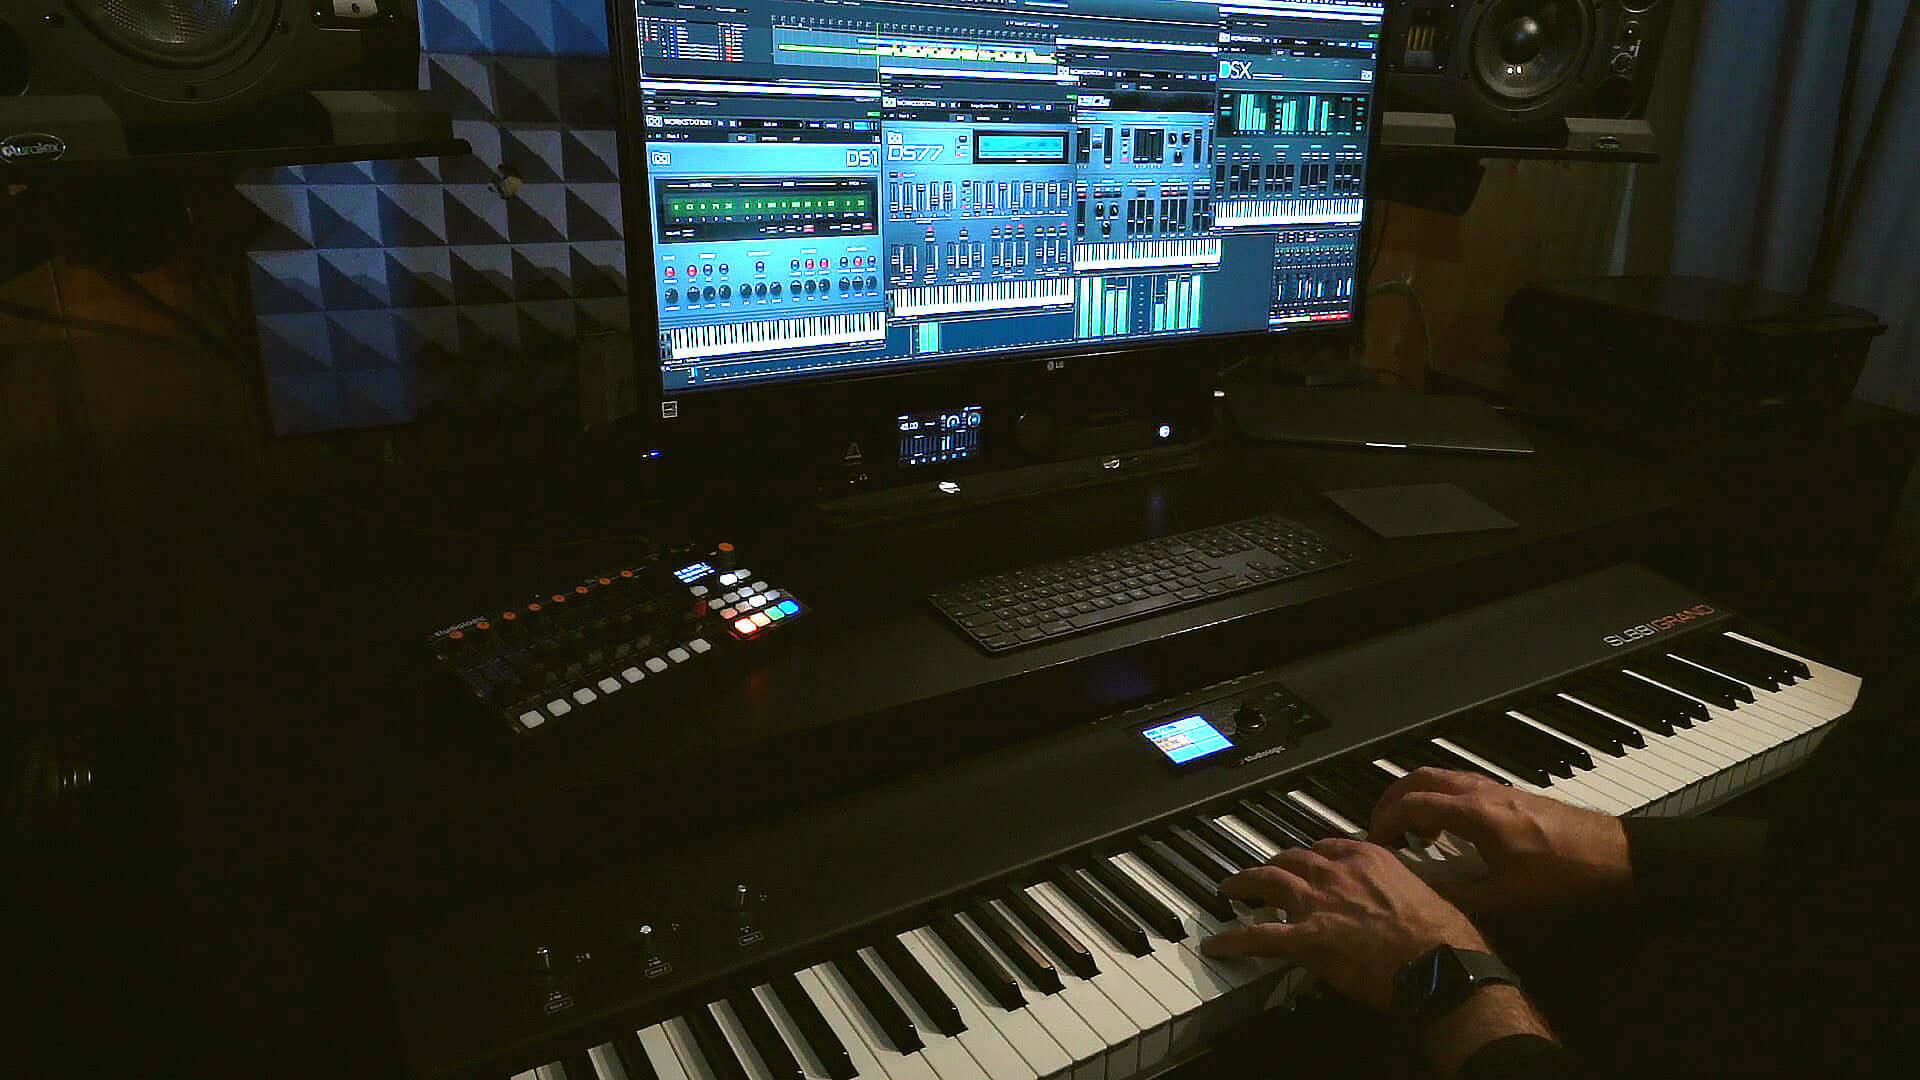 Studiologic製品購入でUVI『Digital Synsations』もプレゼント!期間限定キャンペーンが開始 music200402_studiologic_4-1920x1080